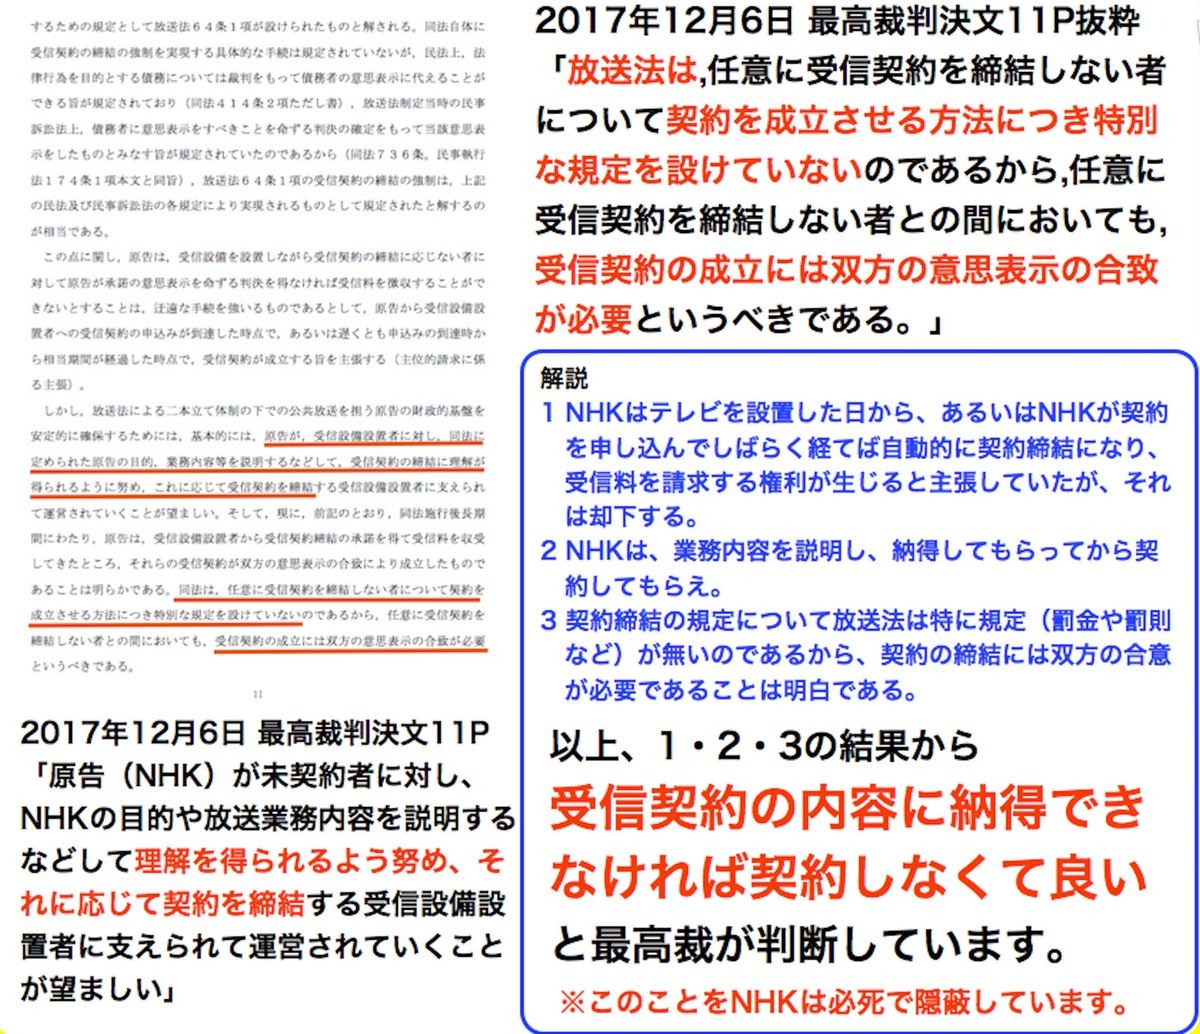 NHK受信契約に関する最高裁判所の判断